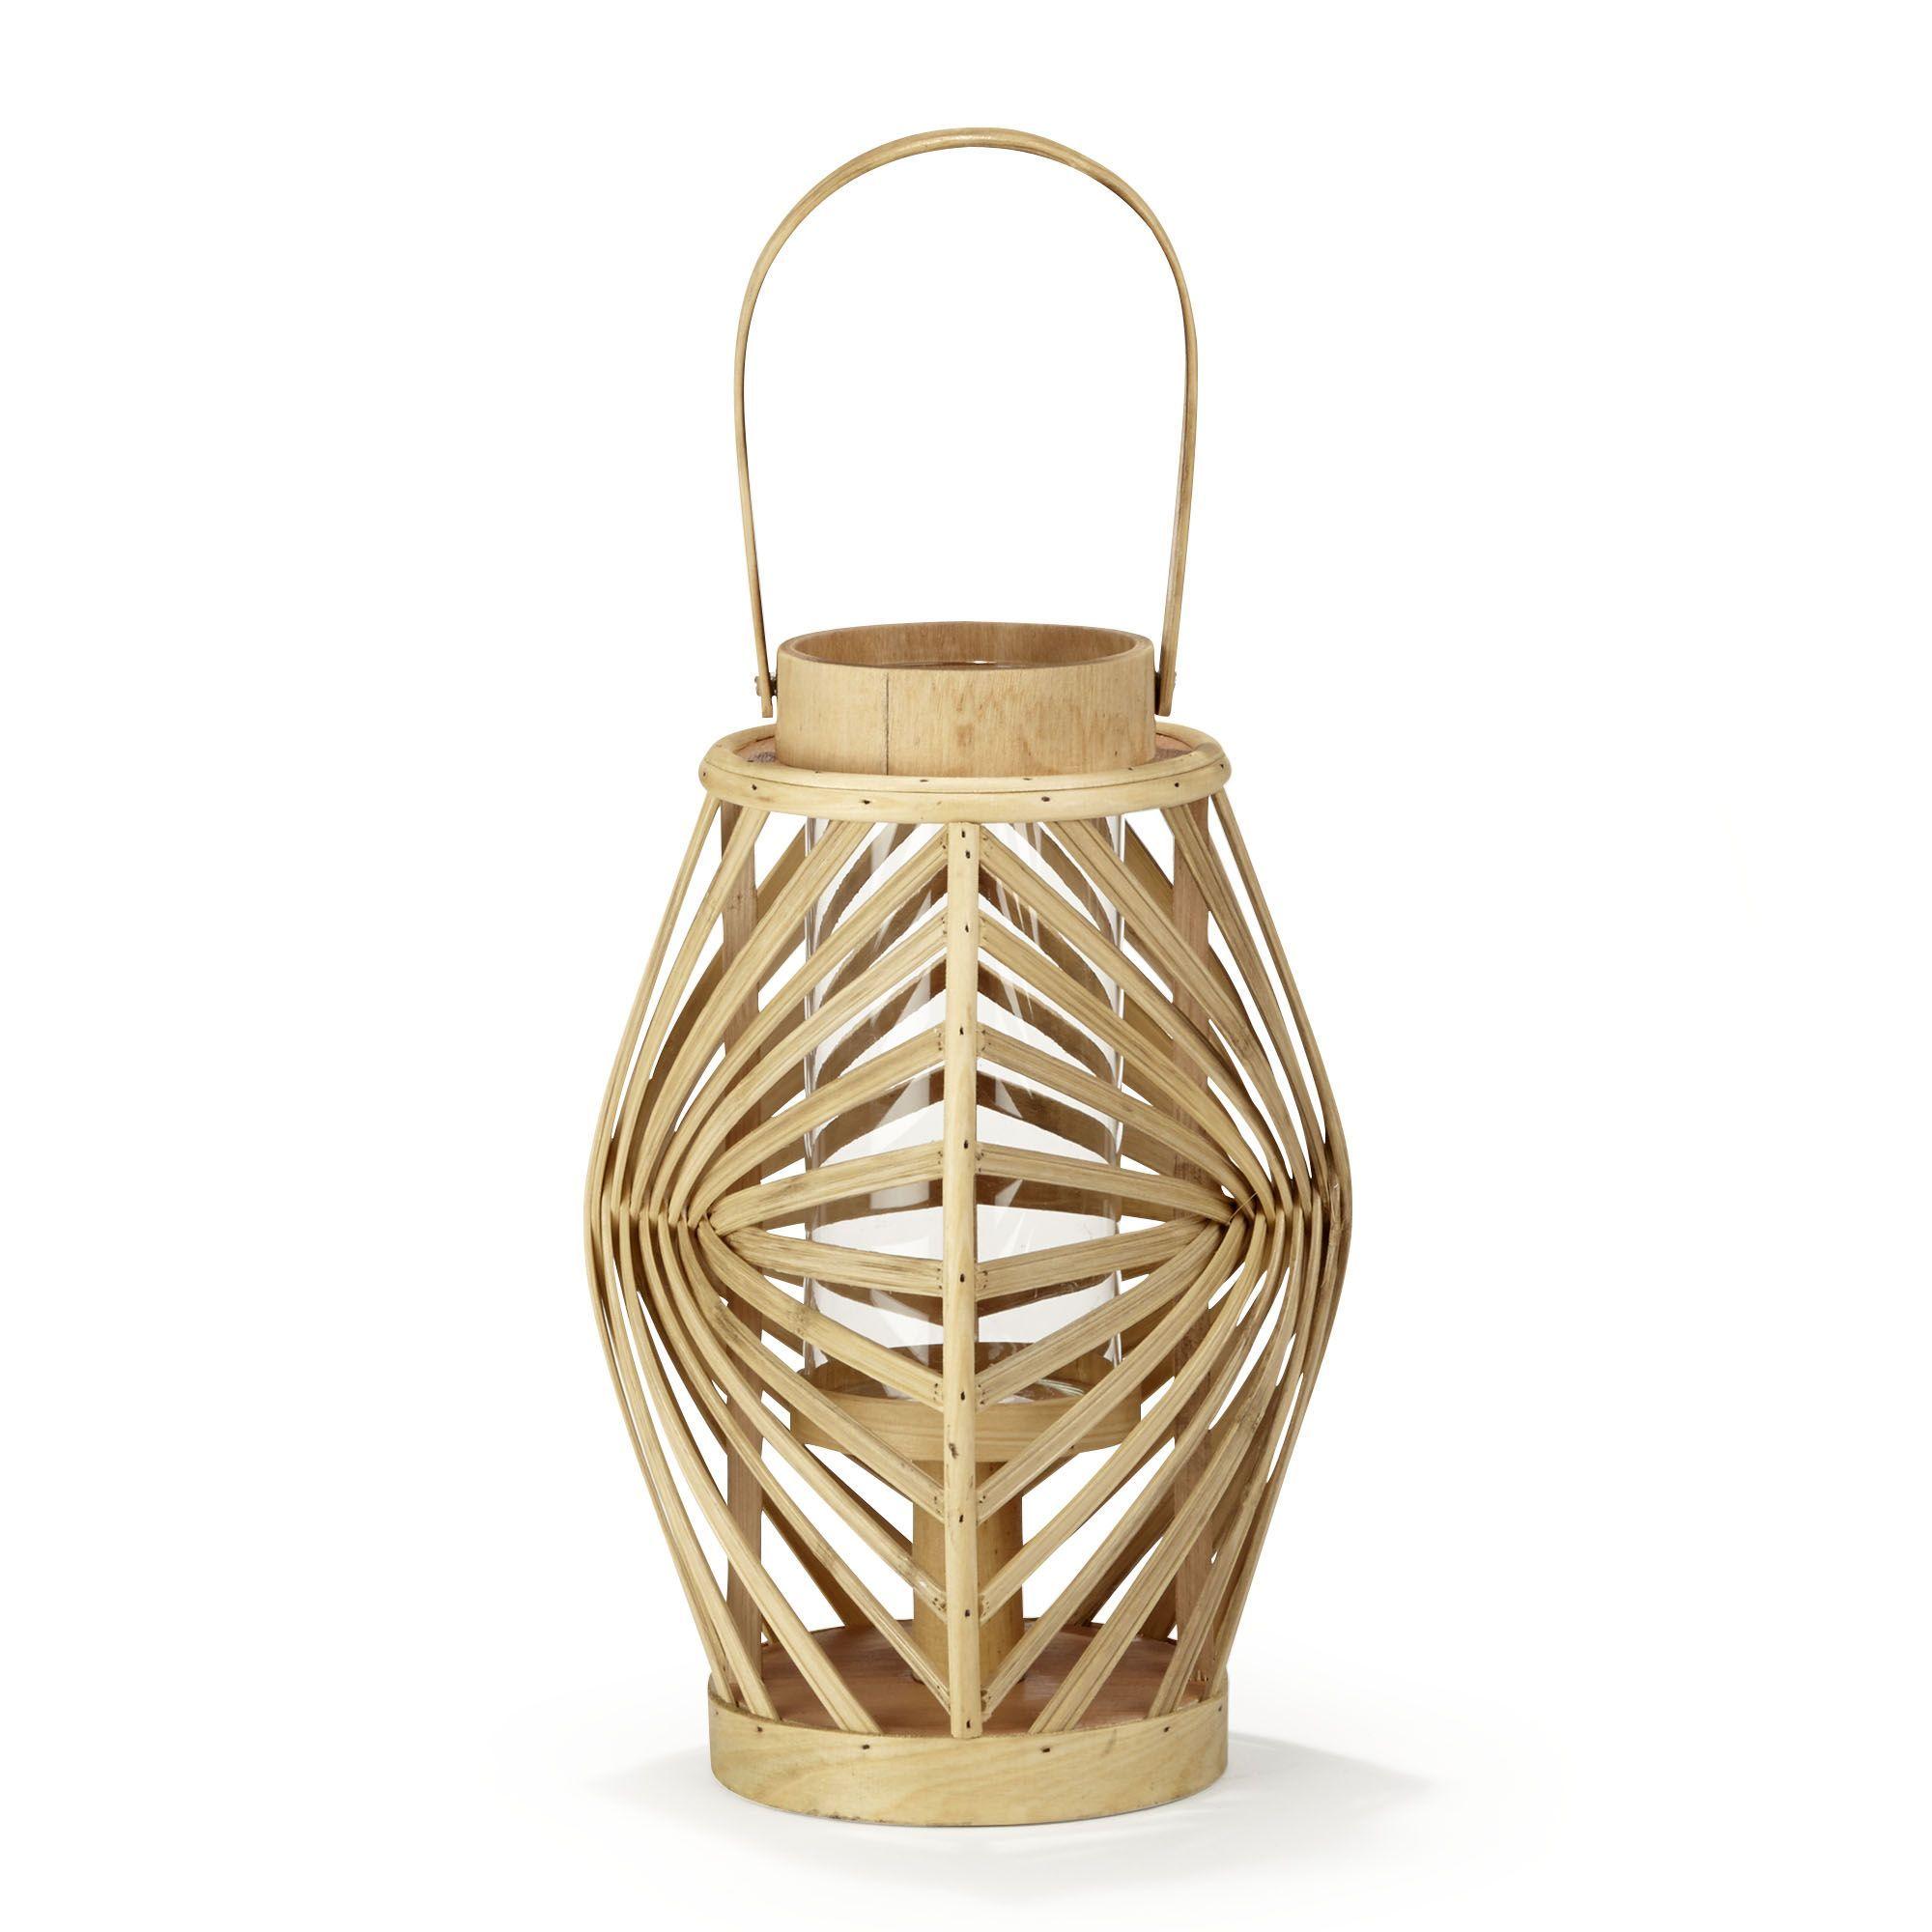 lanterne en bambou bambou martha les objets d coratifs vases et objets de d co salon et. Black Bedroom Furniture Sets. Home Design Ideas